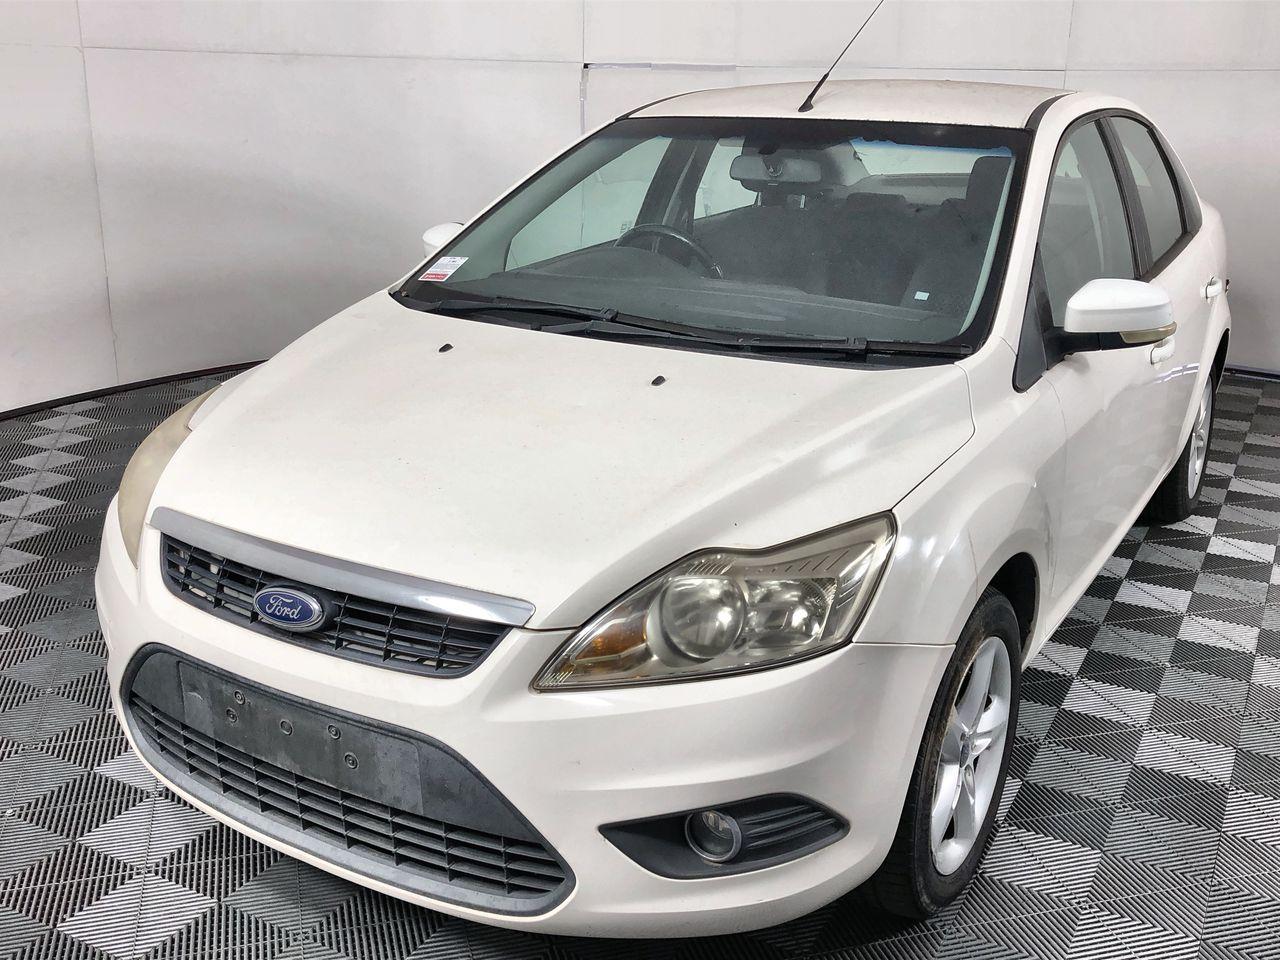 2009 Ford Focus LX LV Automatic Sedan (WOVR+Inspected)